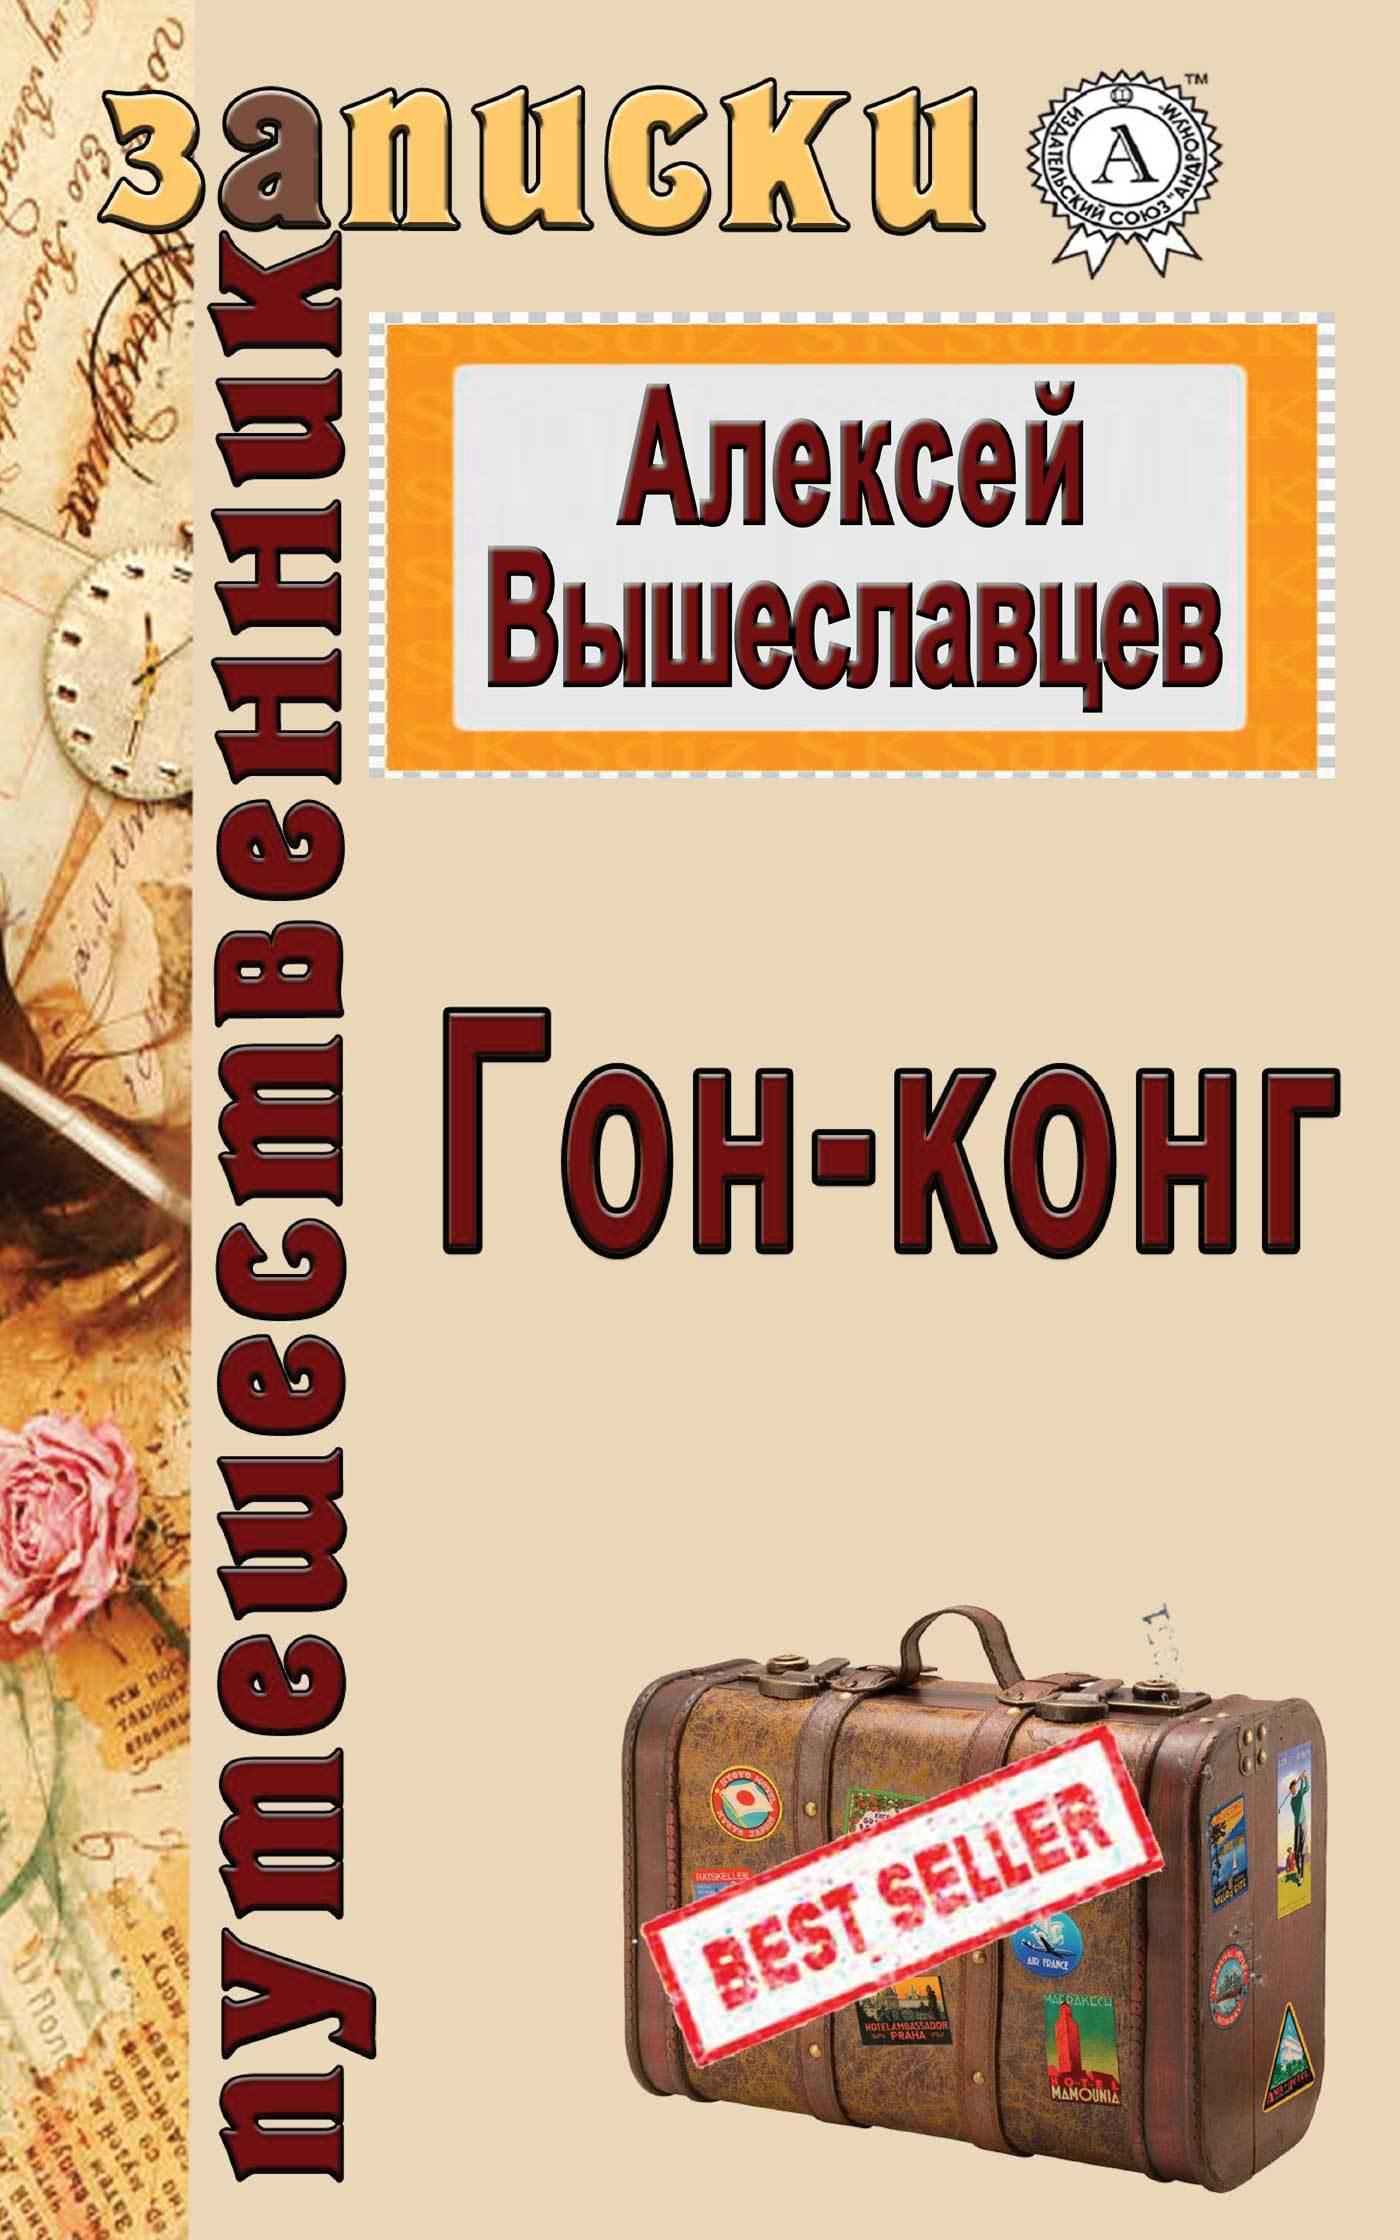 Книга Заметки обОдессе